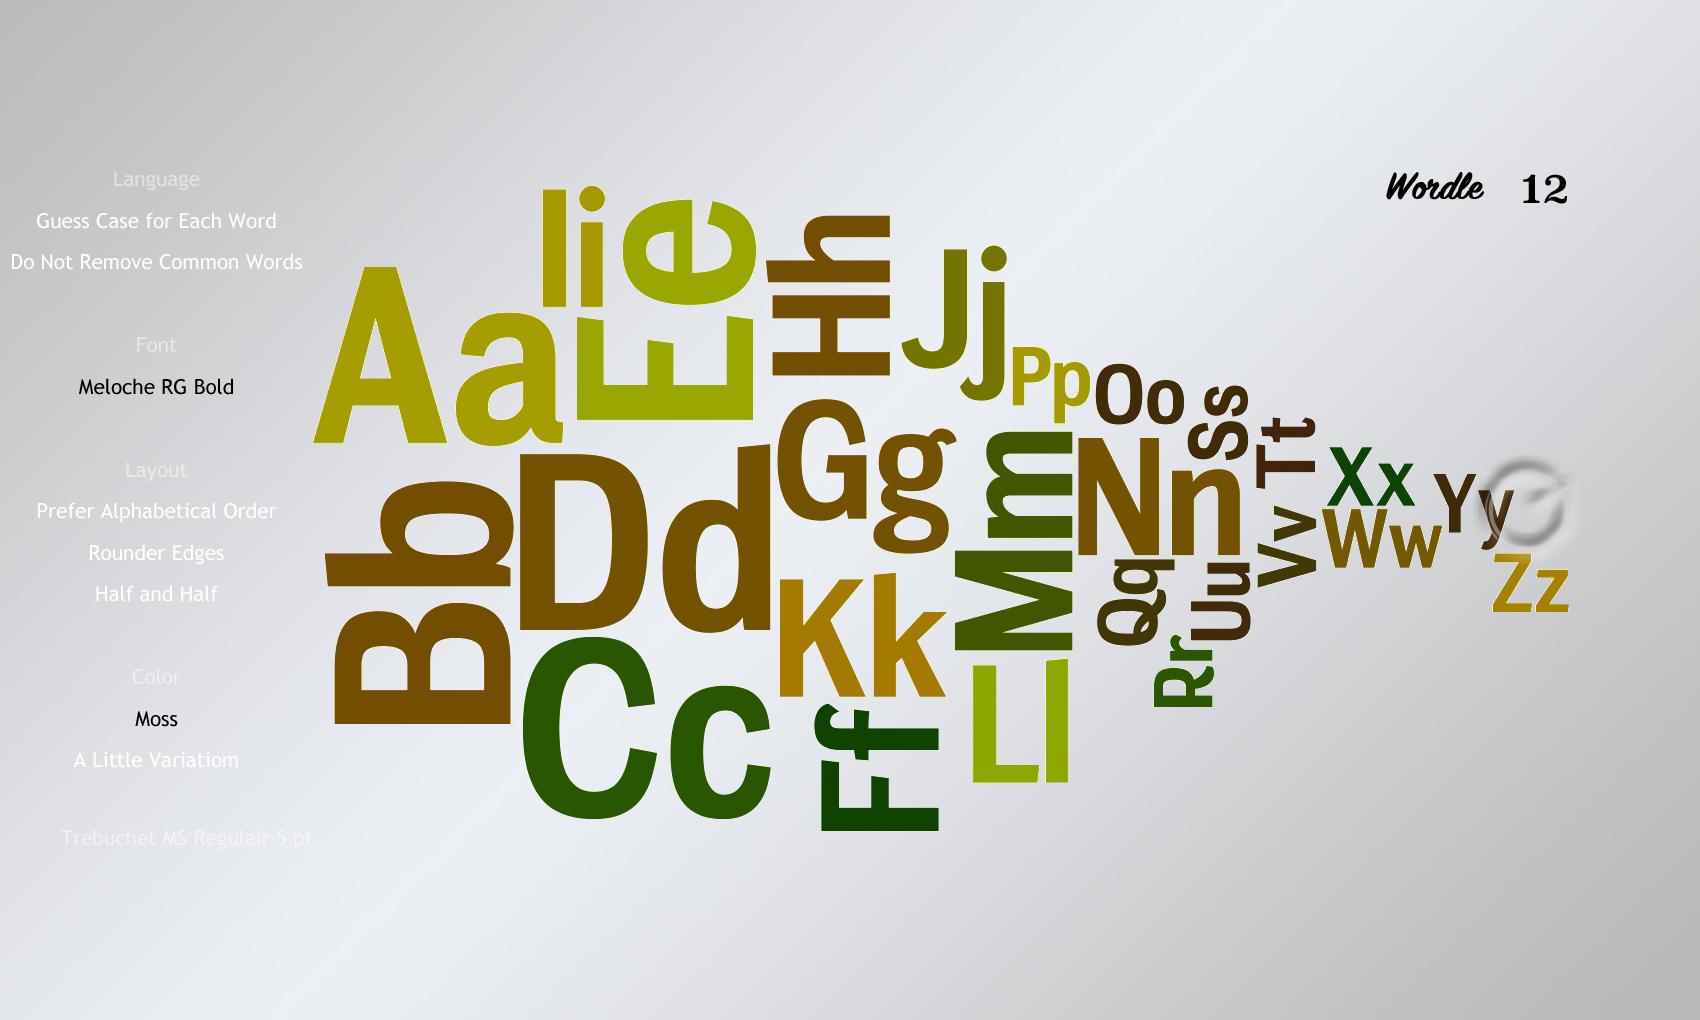 Wordle12 Meloche RG Bold